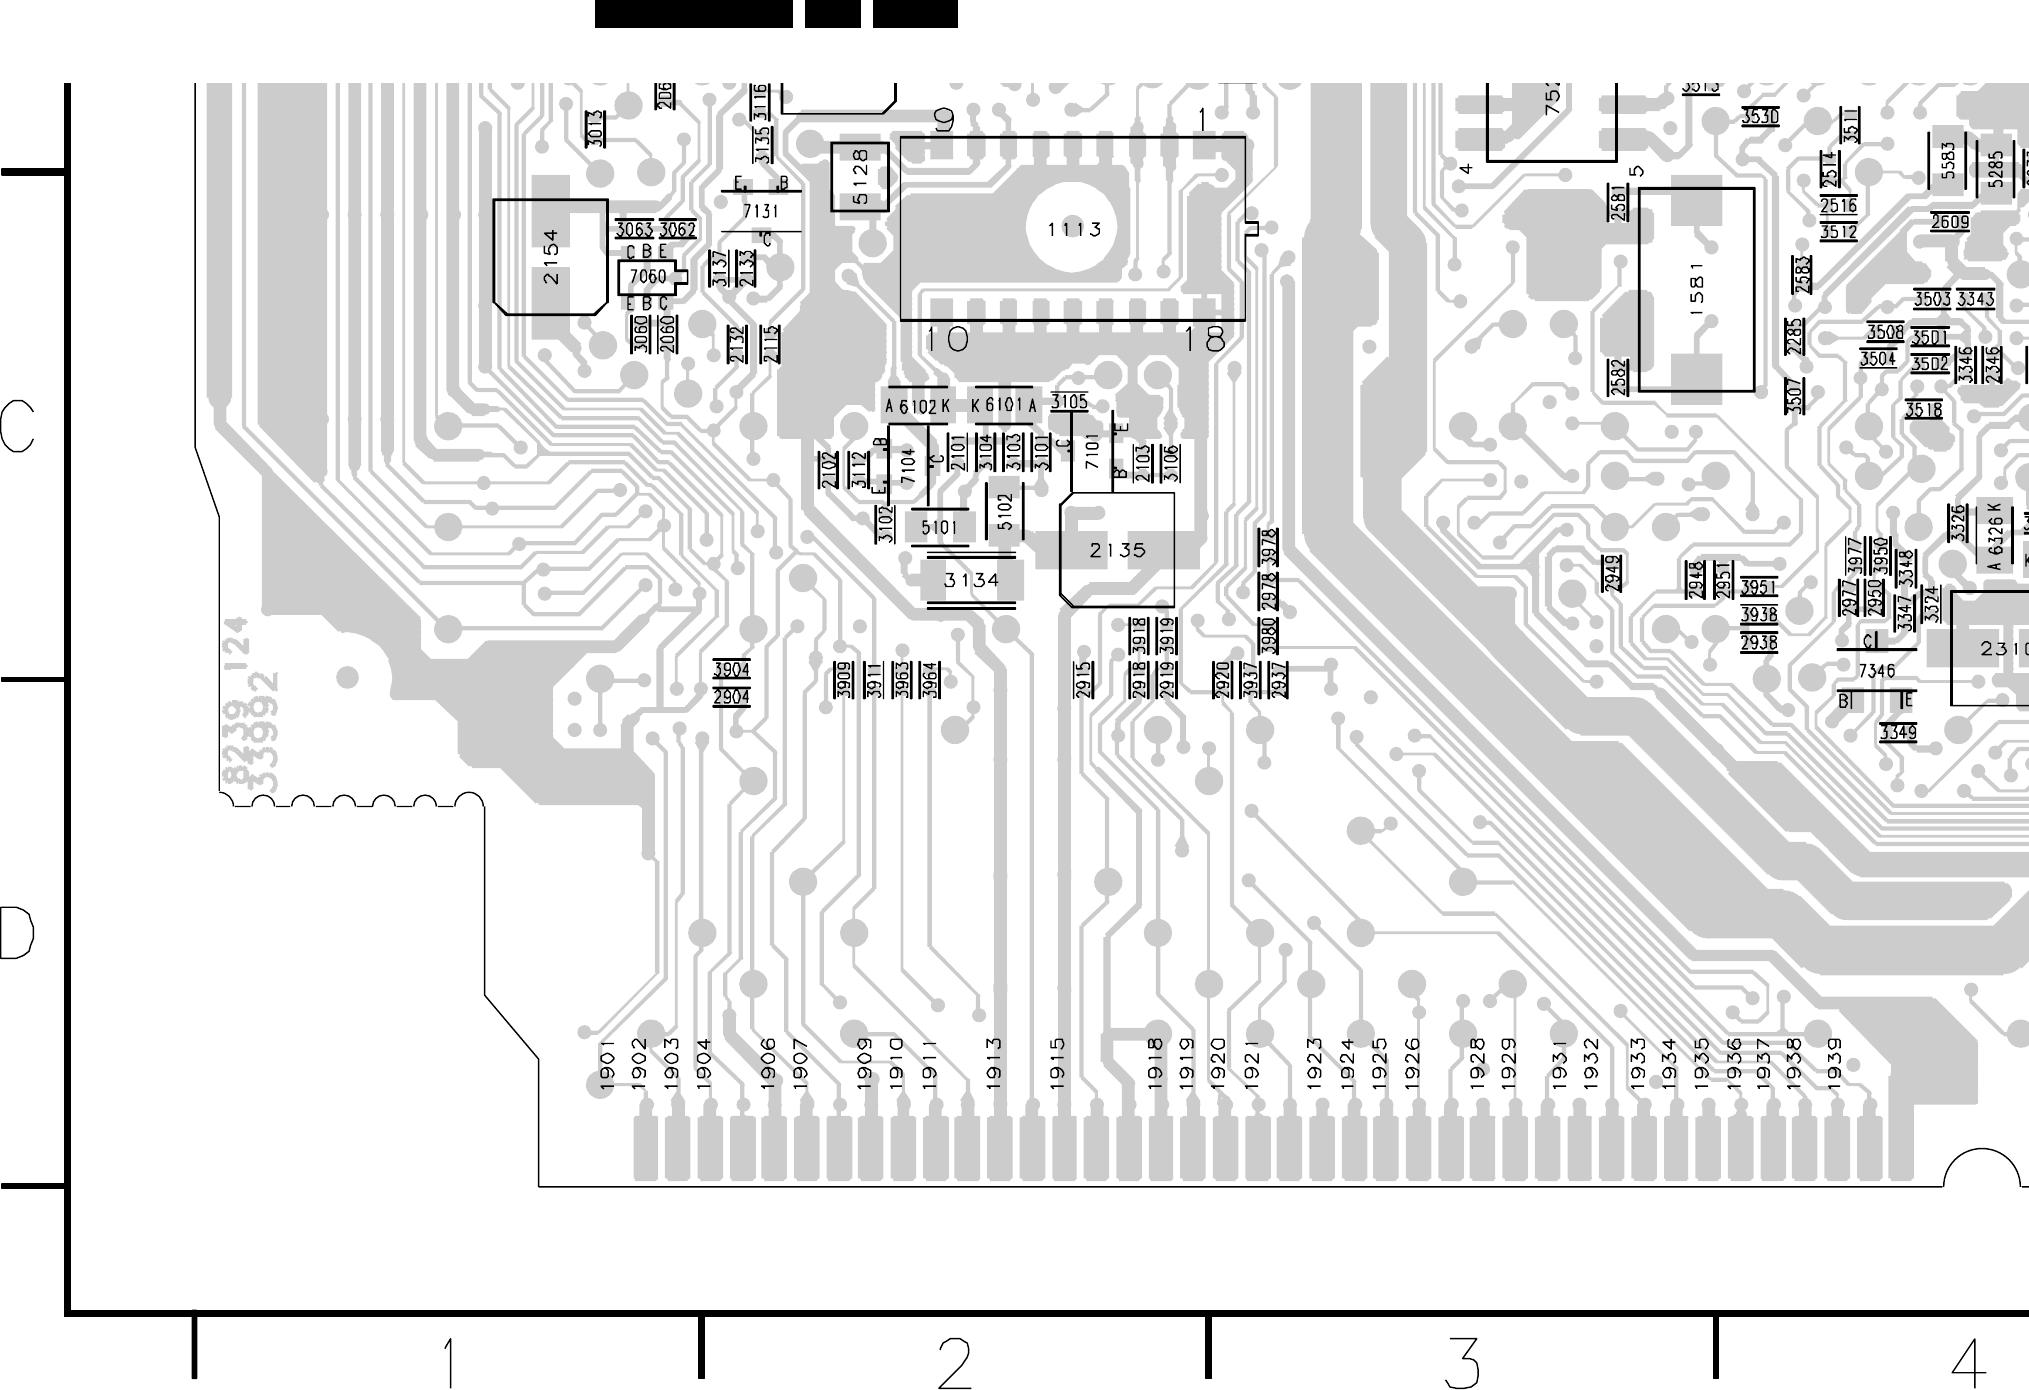 altec bucket trucks wiring diagrams wiring diagram altec 6 04c wiring diagrams site  wiring diagram altec 6 04c wiring